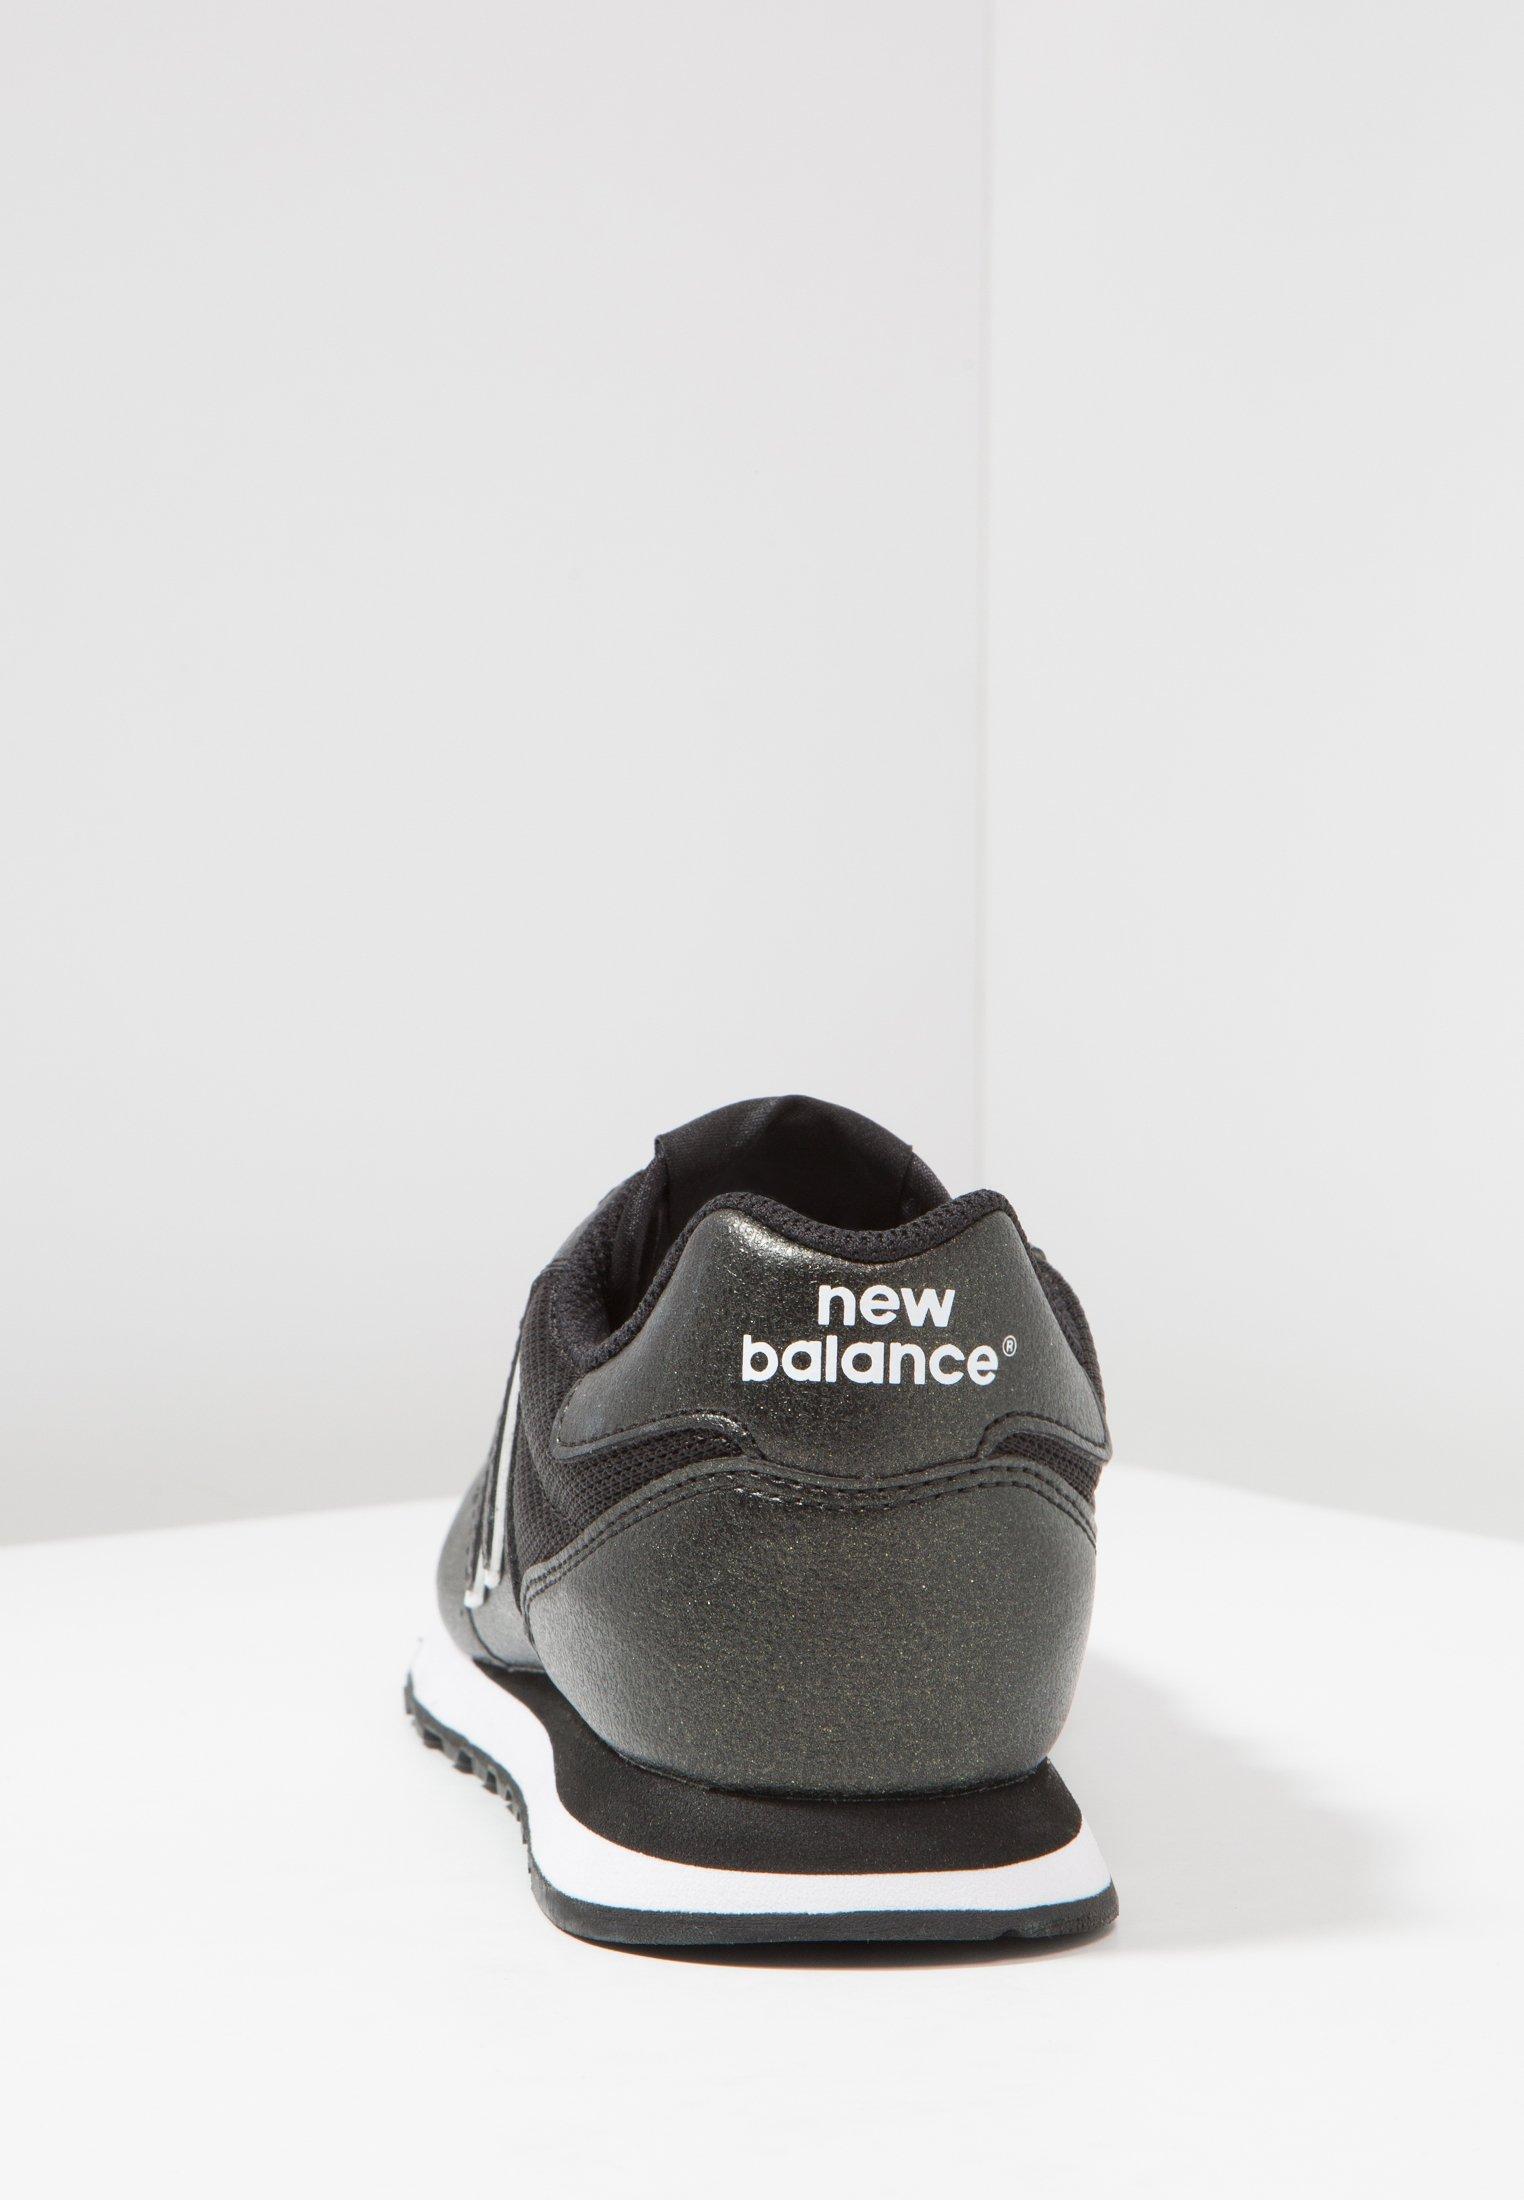 gw 500 new balance negro